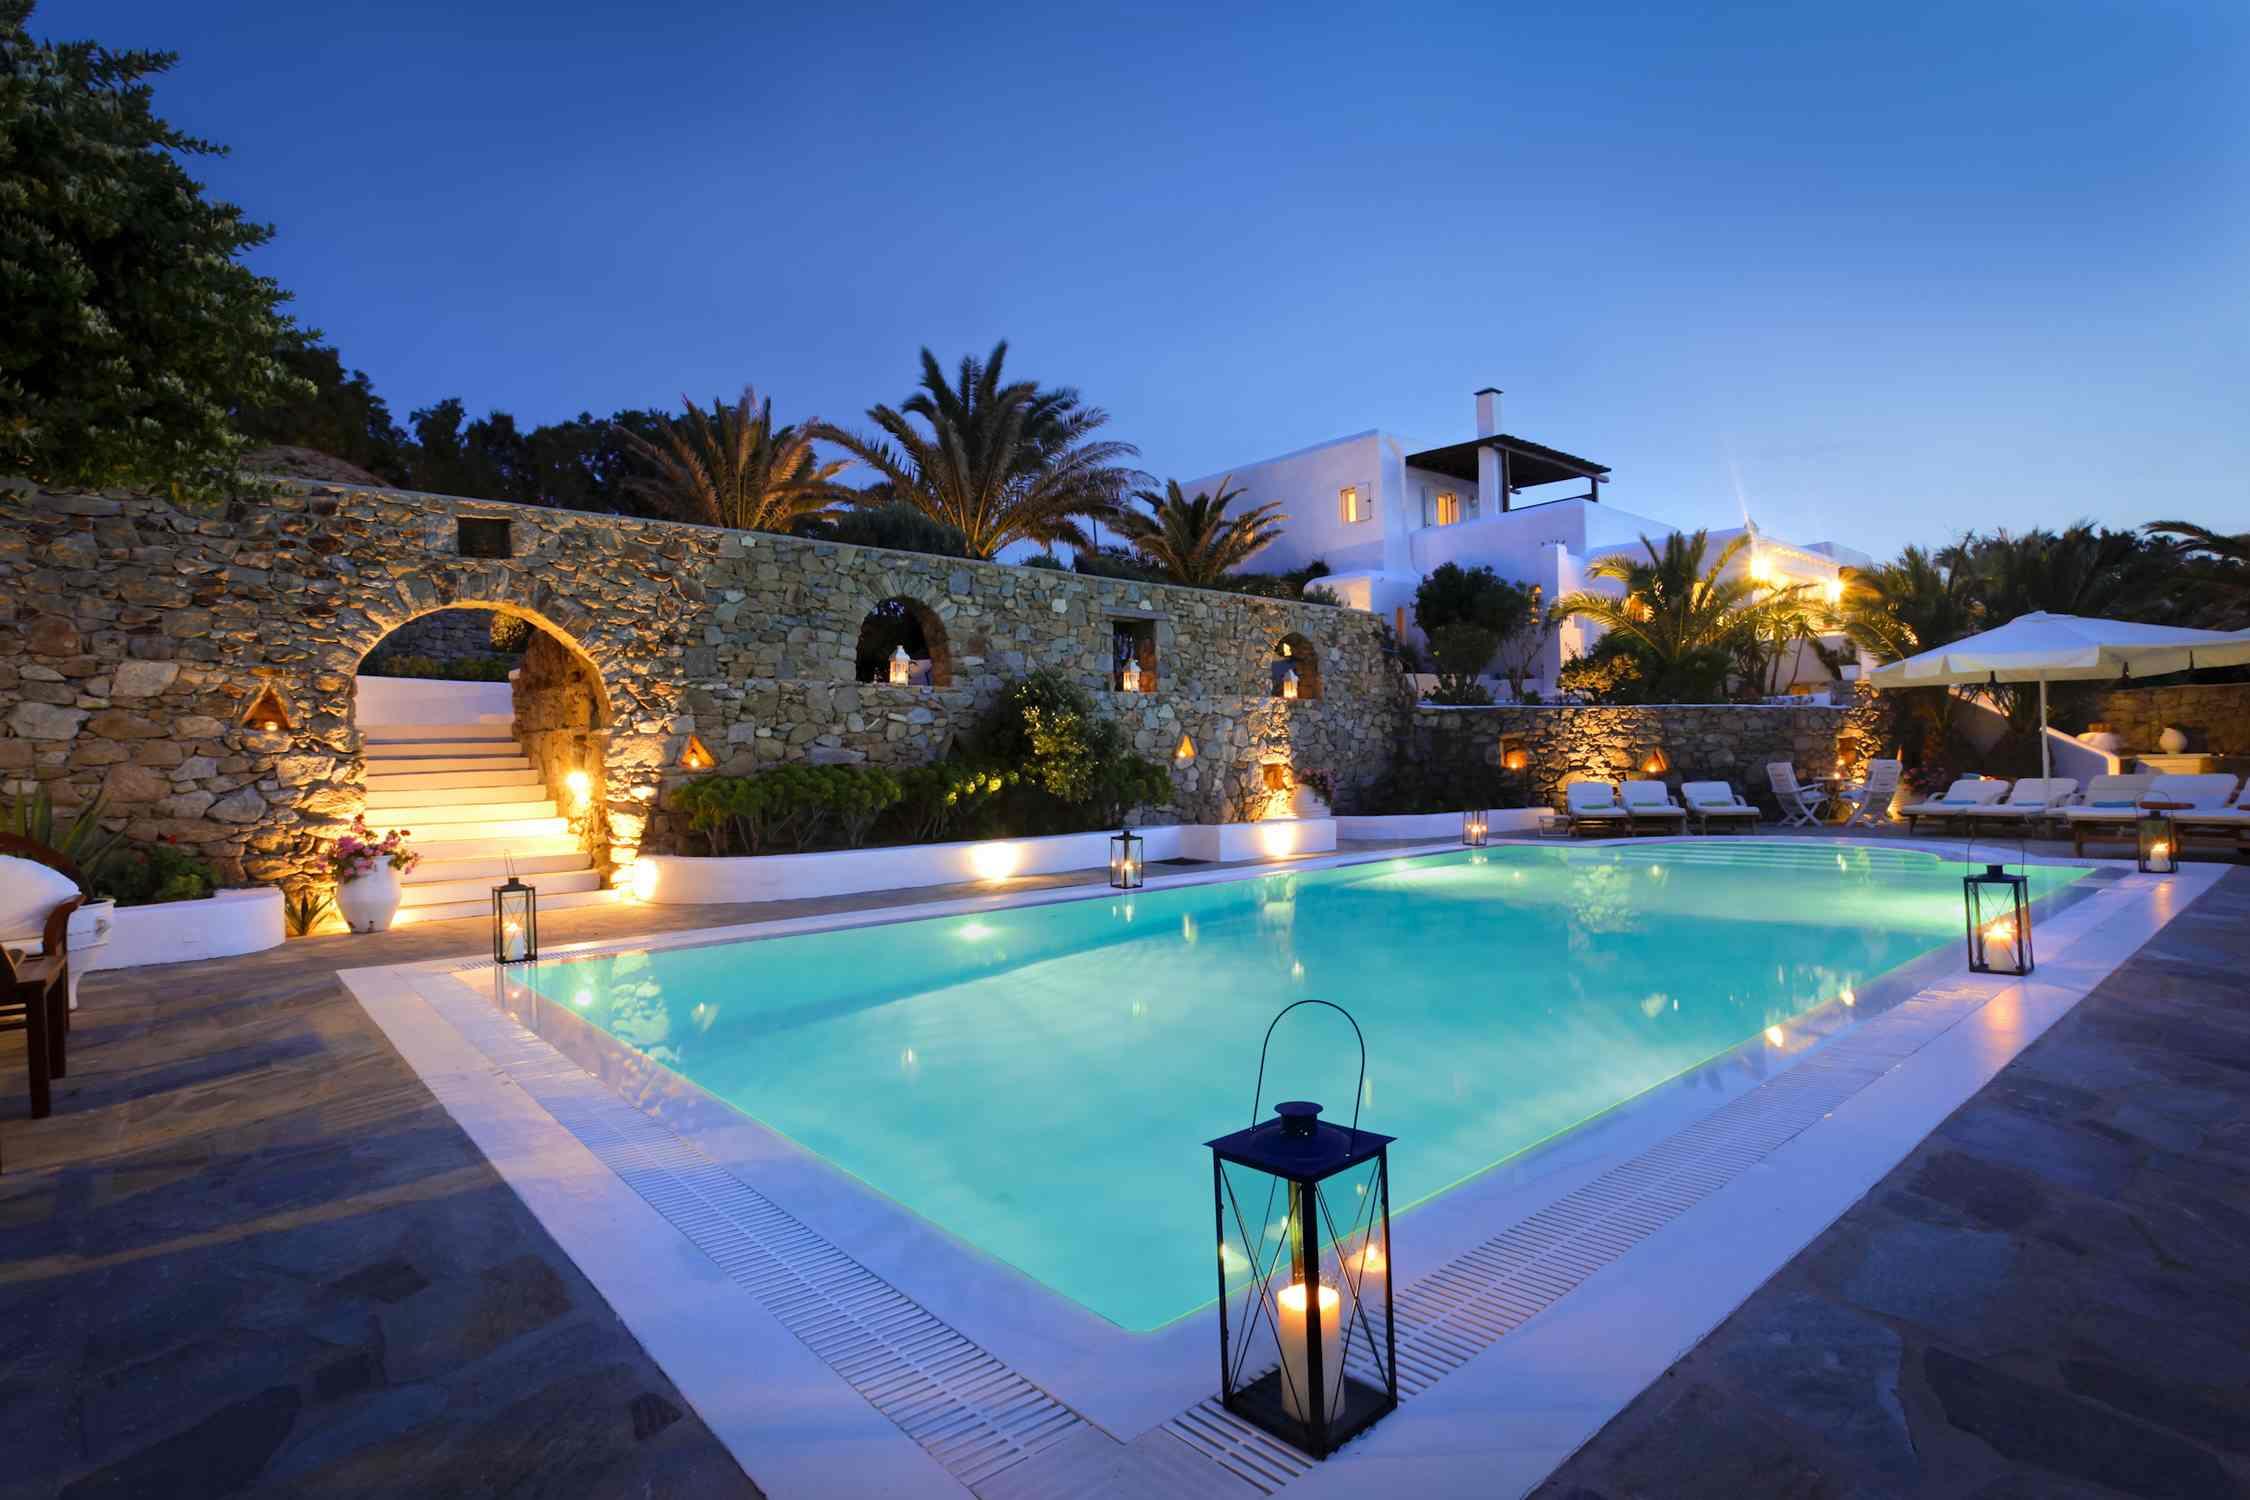 Best Island Beaches For Partying Mykonos St Barts: Hurmuses Villa In Mykonos